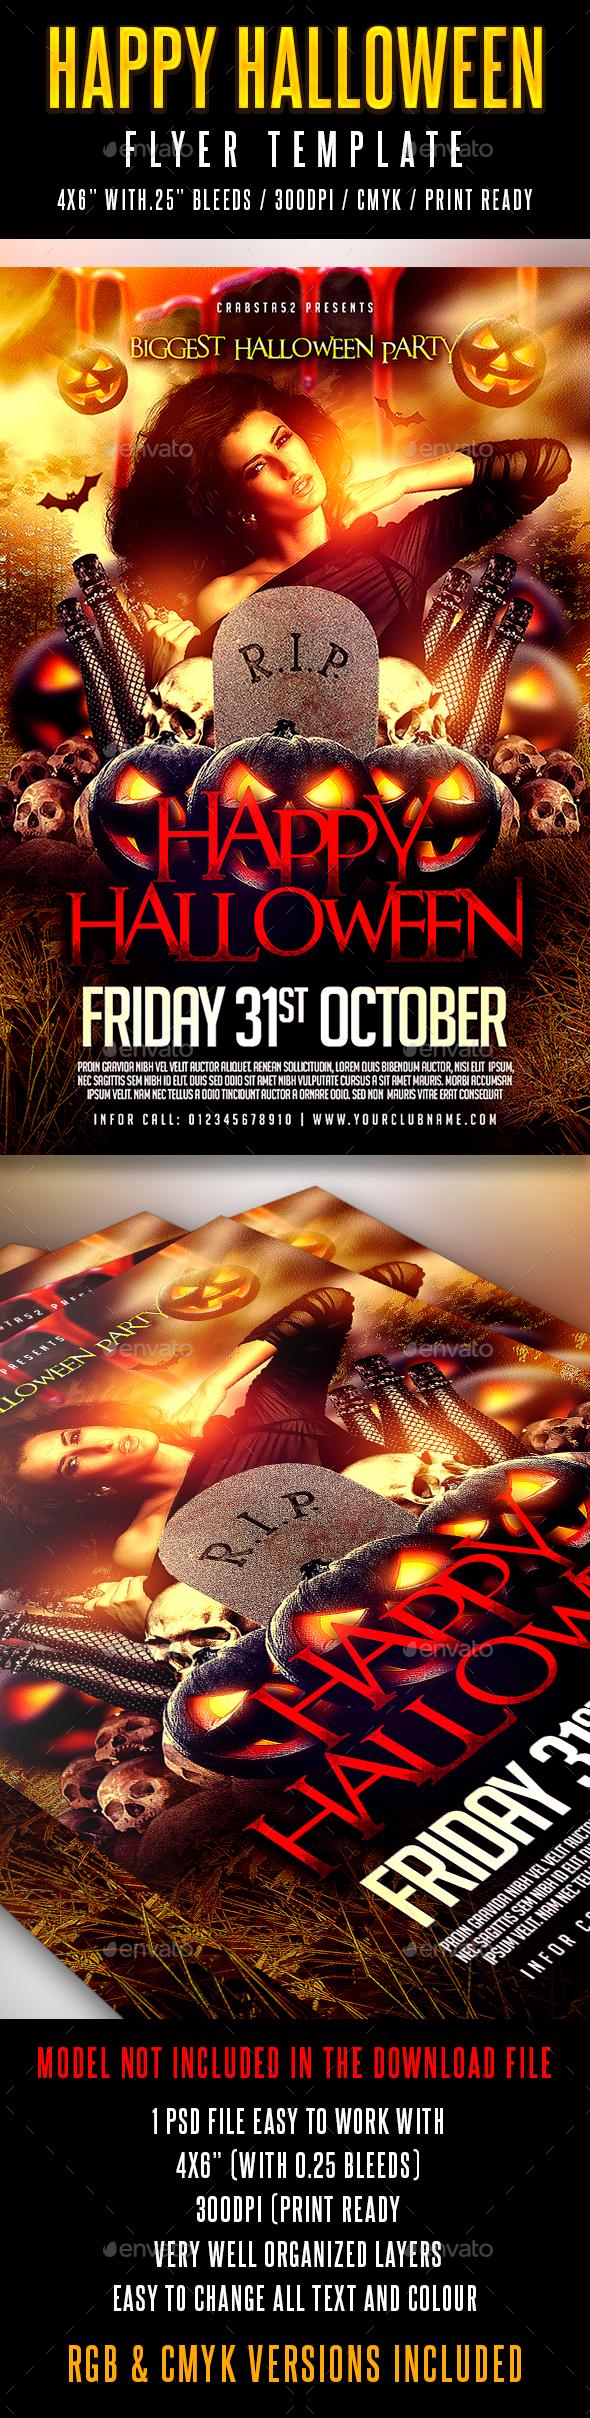 Happy Halloween Flyer Template - Flyers Print Templates